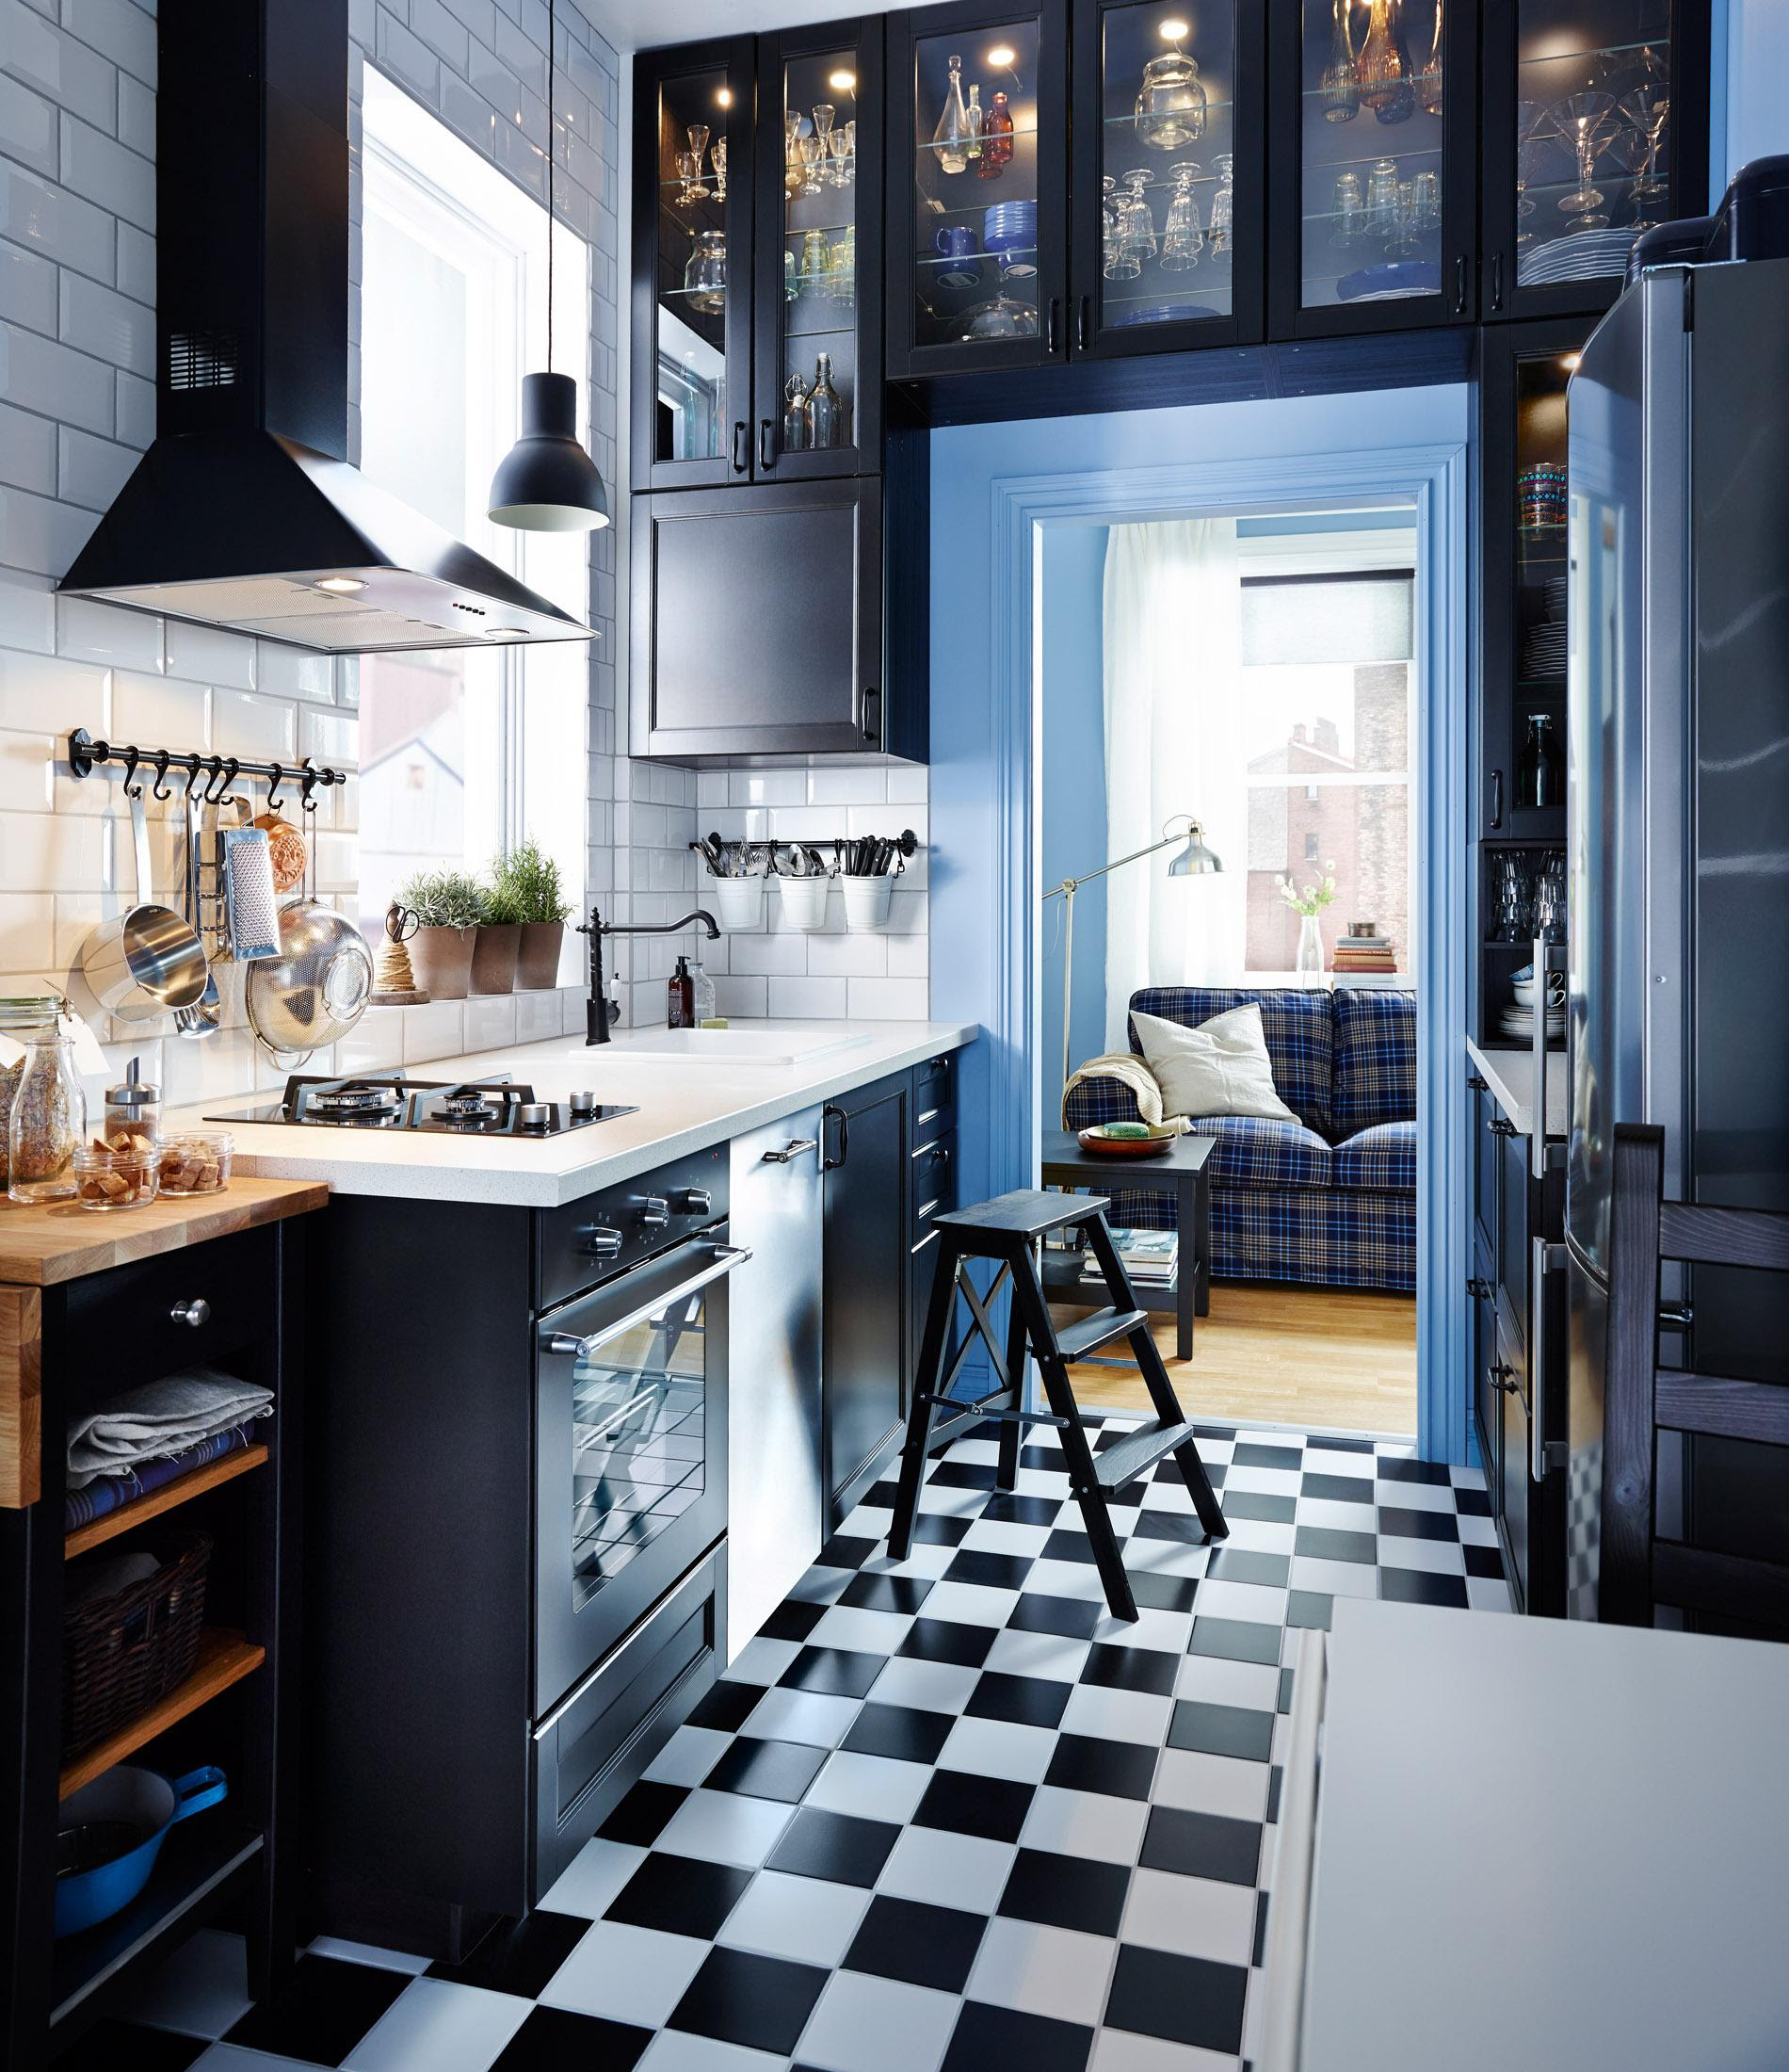 Küchenboden Fliesen Ideen Bauarena Kchenwelt Grosse ...